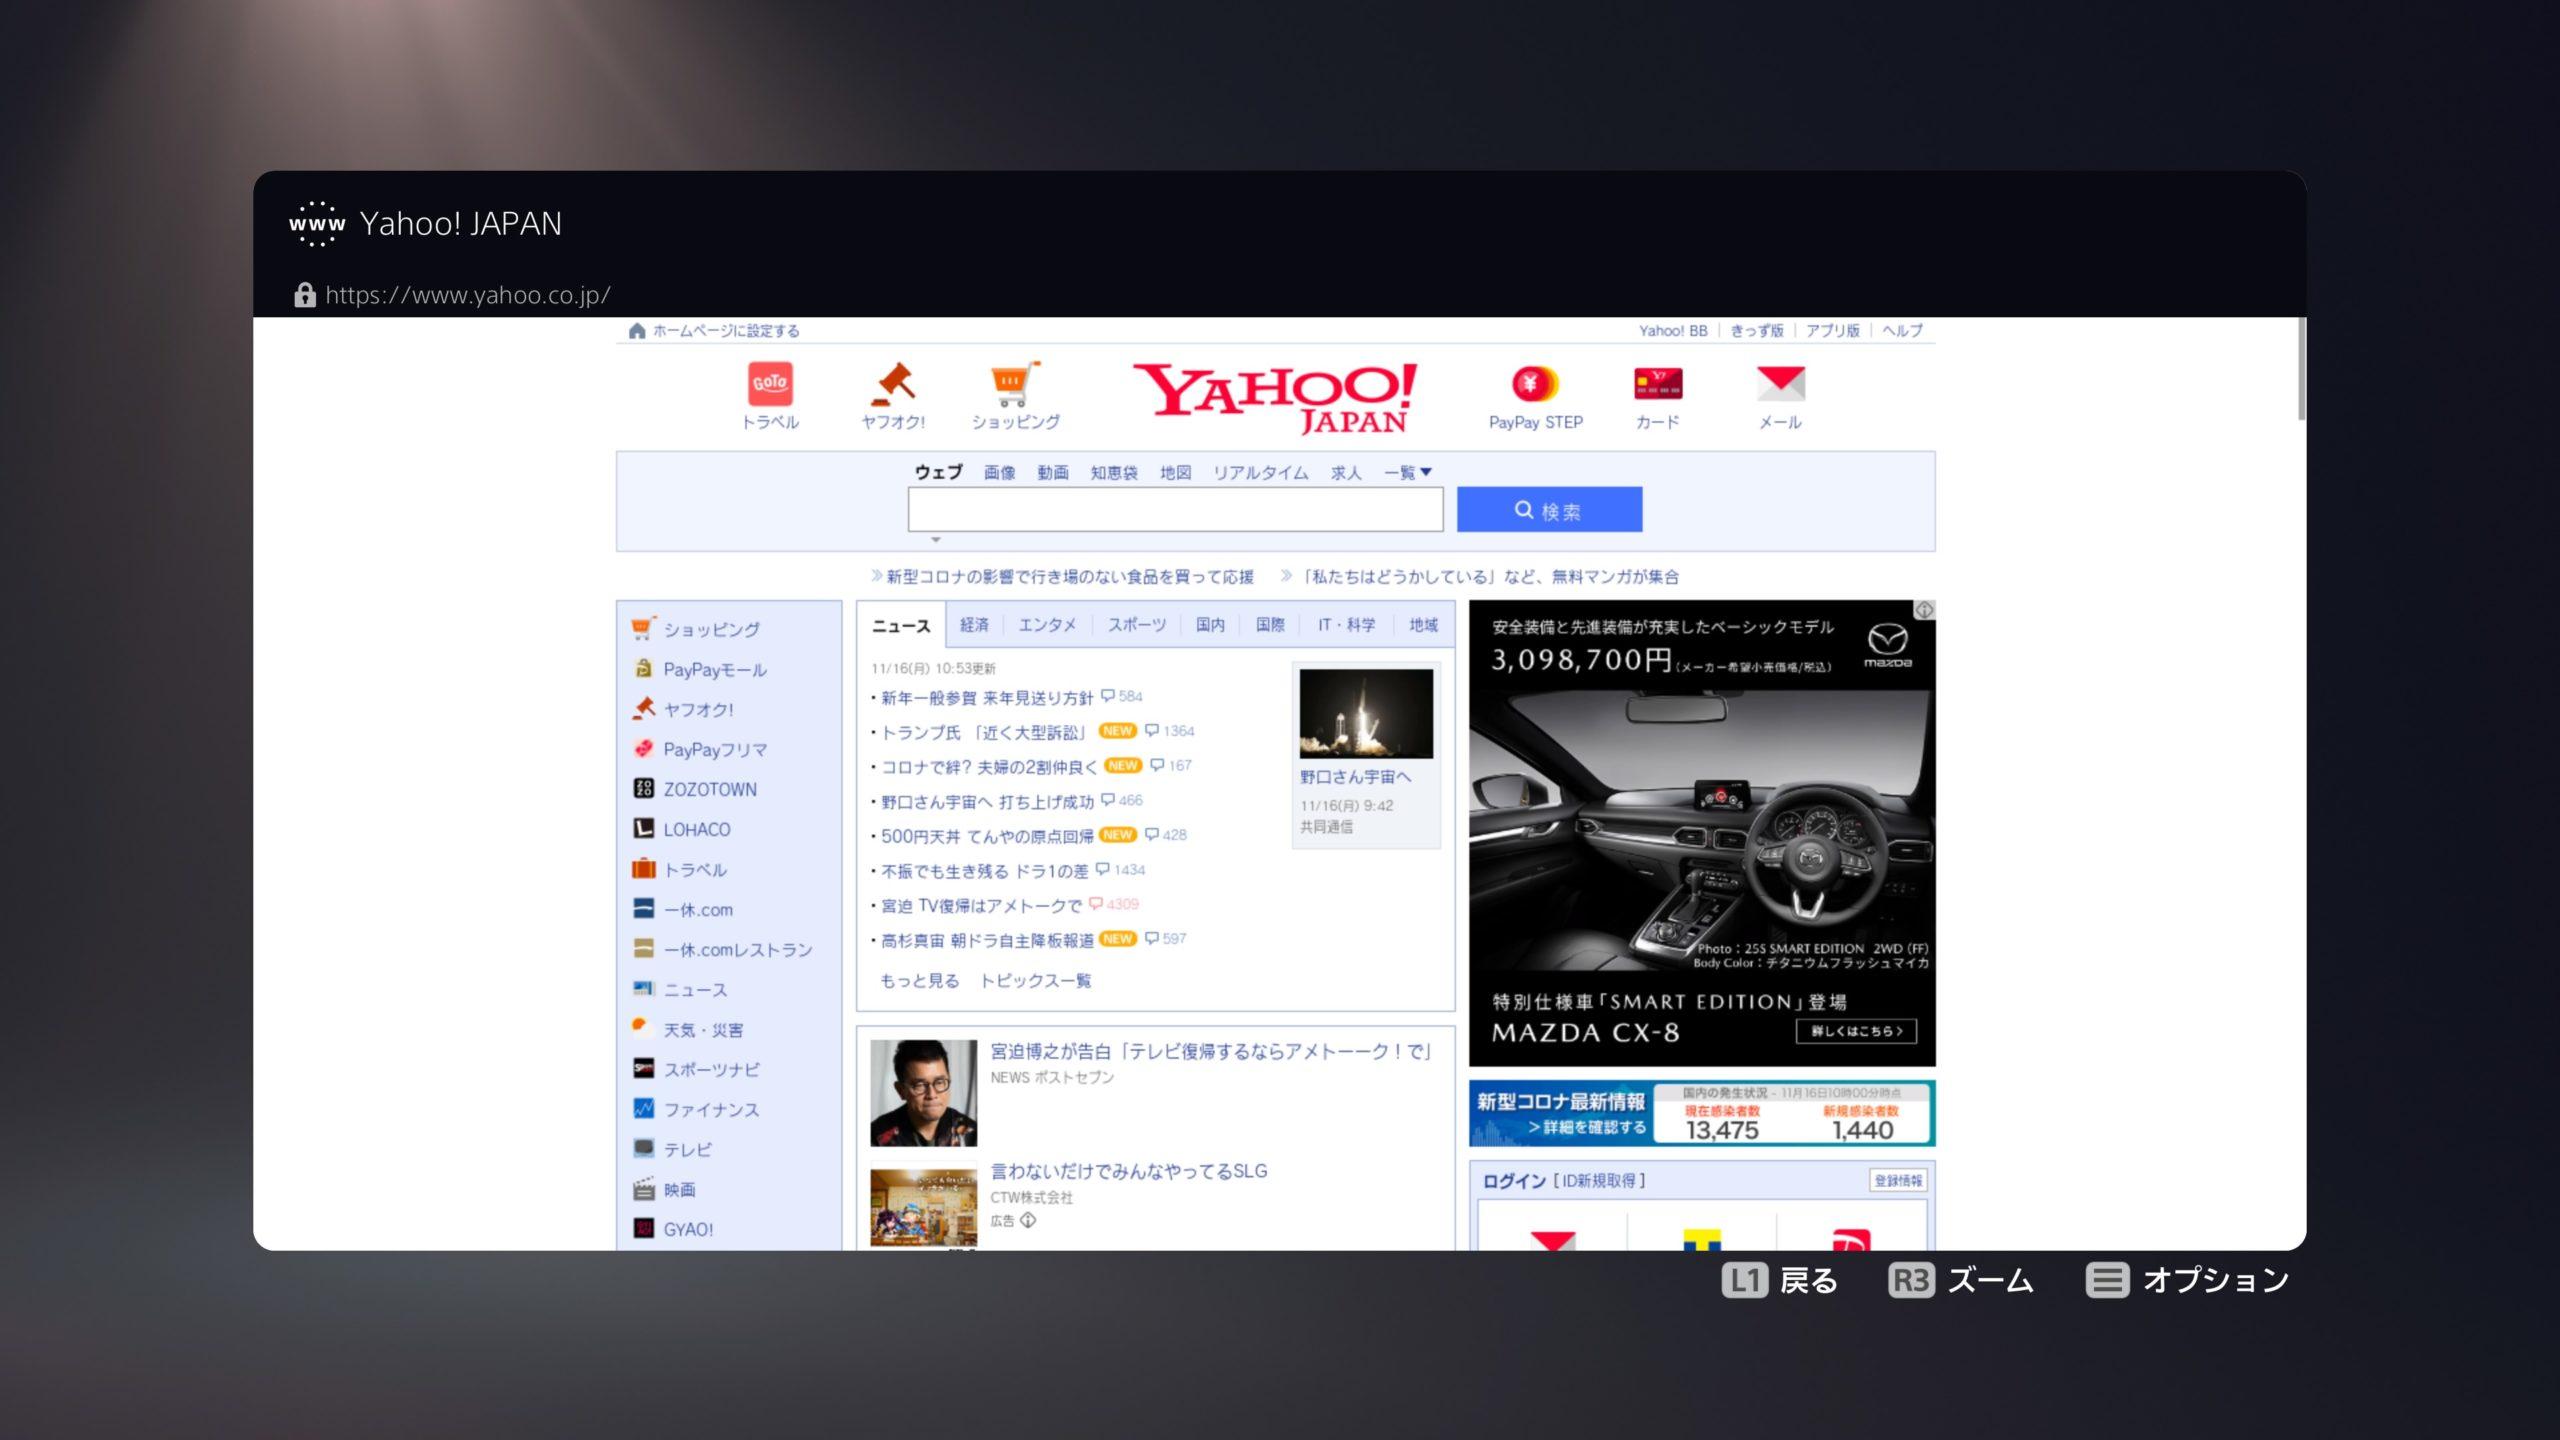 PS5 Yahoo!トップページも問題なく表示